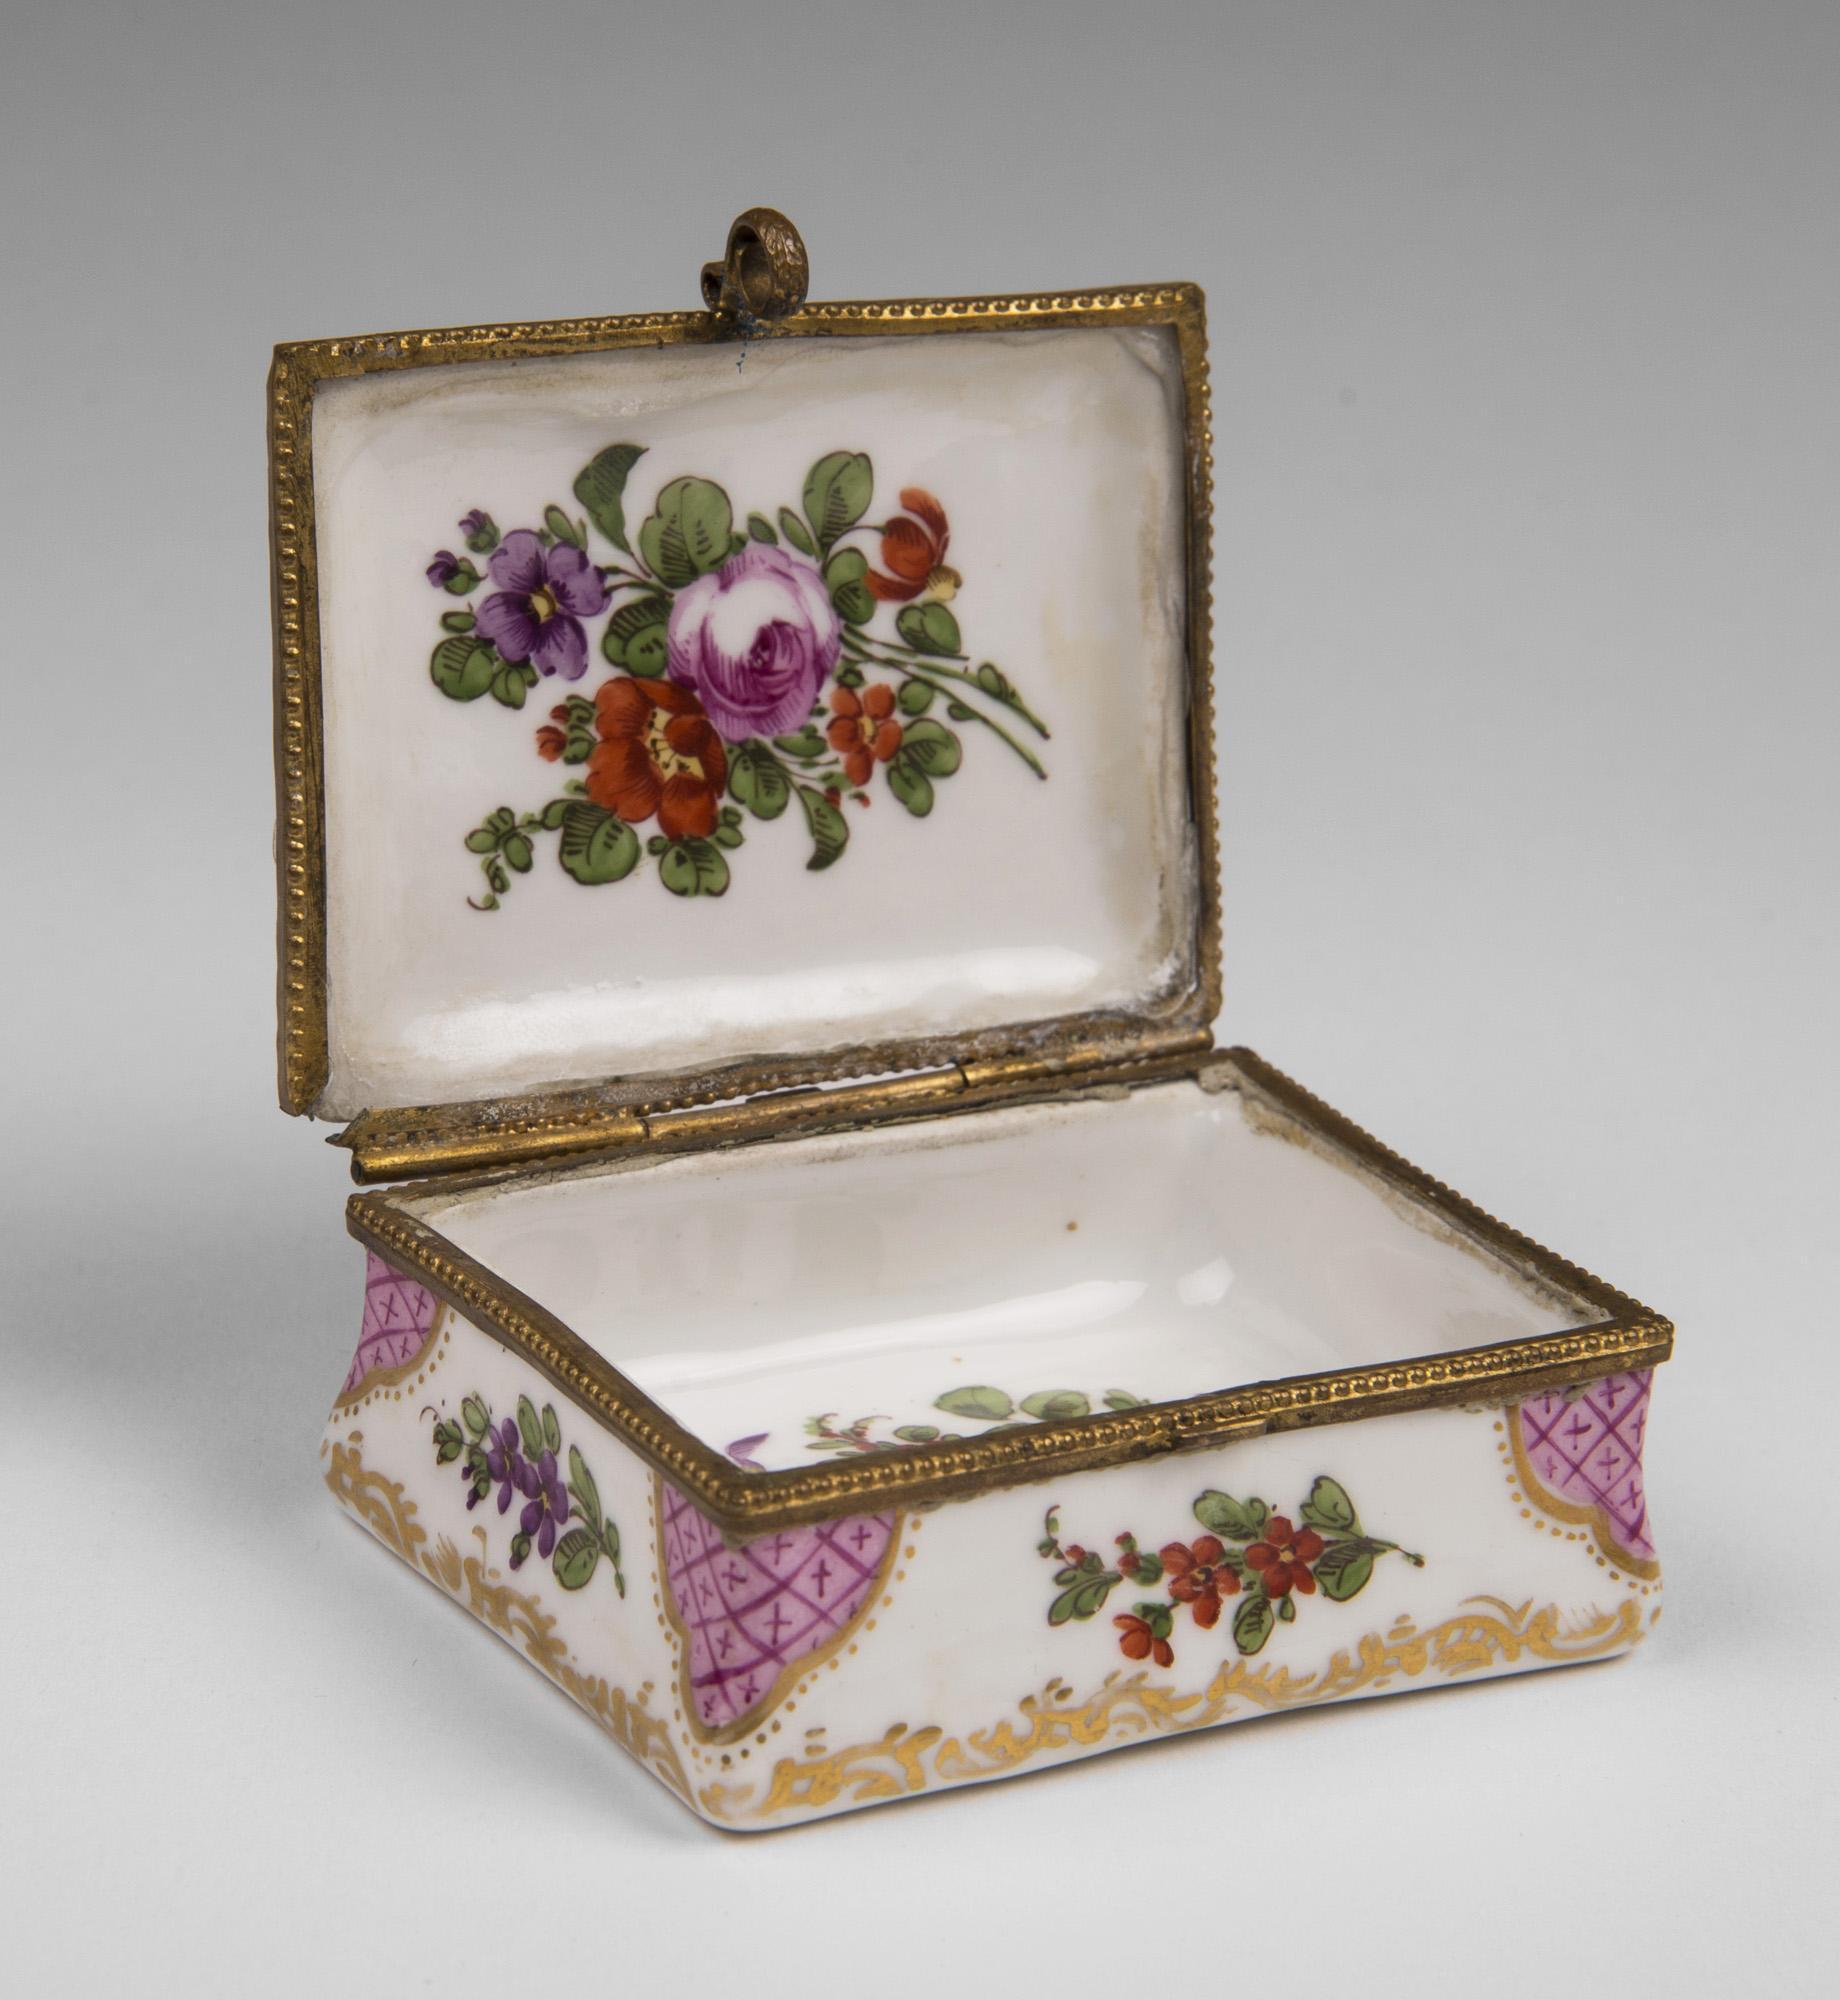 19th C. French Enamel Hand Painted Snuff Box